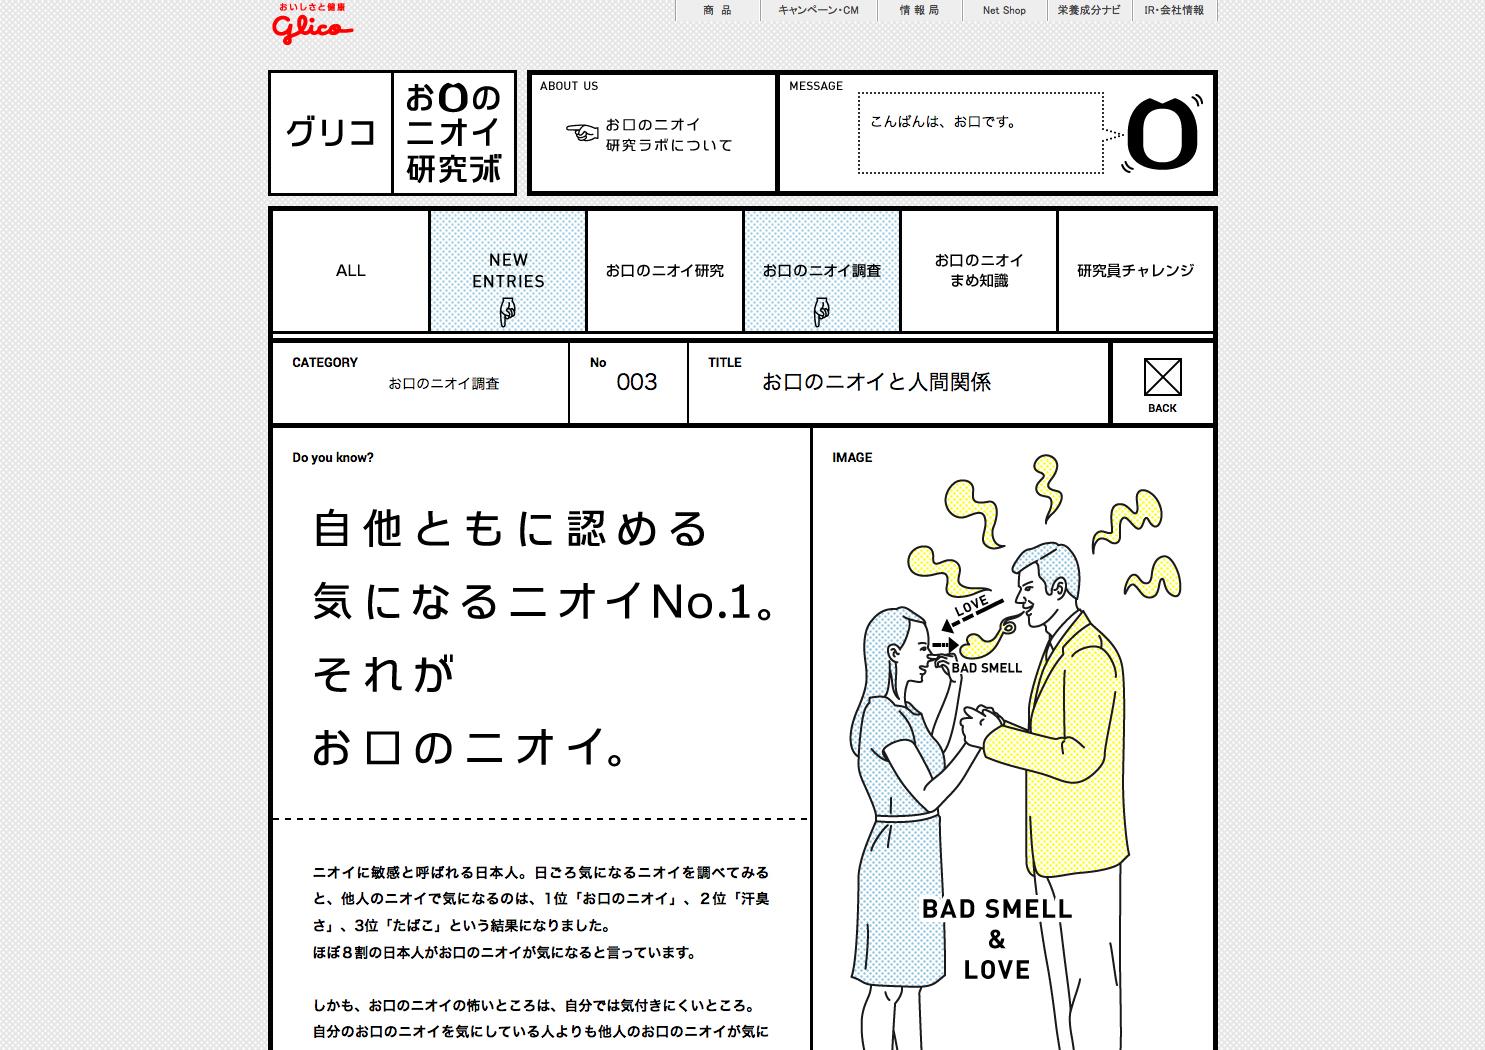 Glico okuchi no nioi kenkyu lab Website 2013